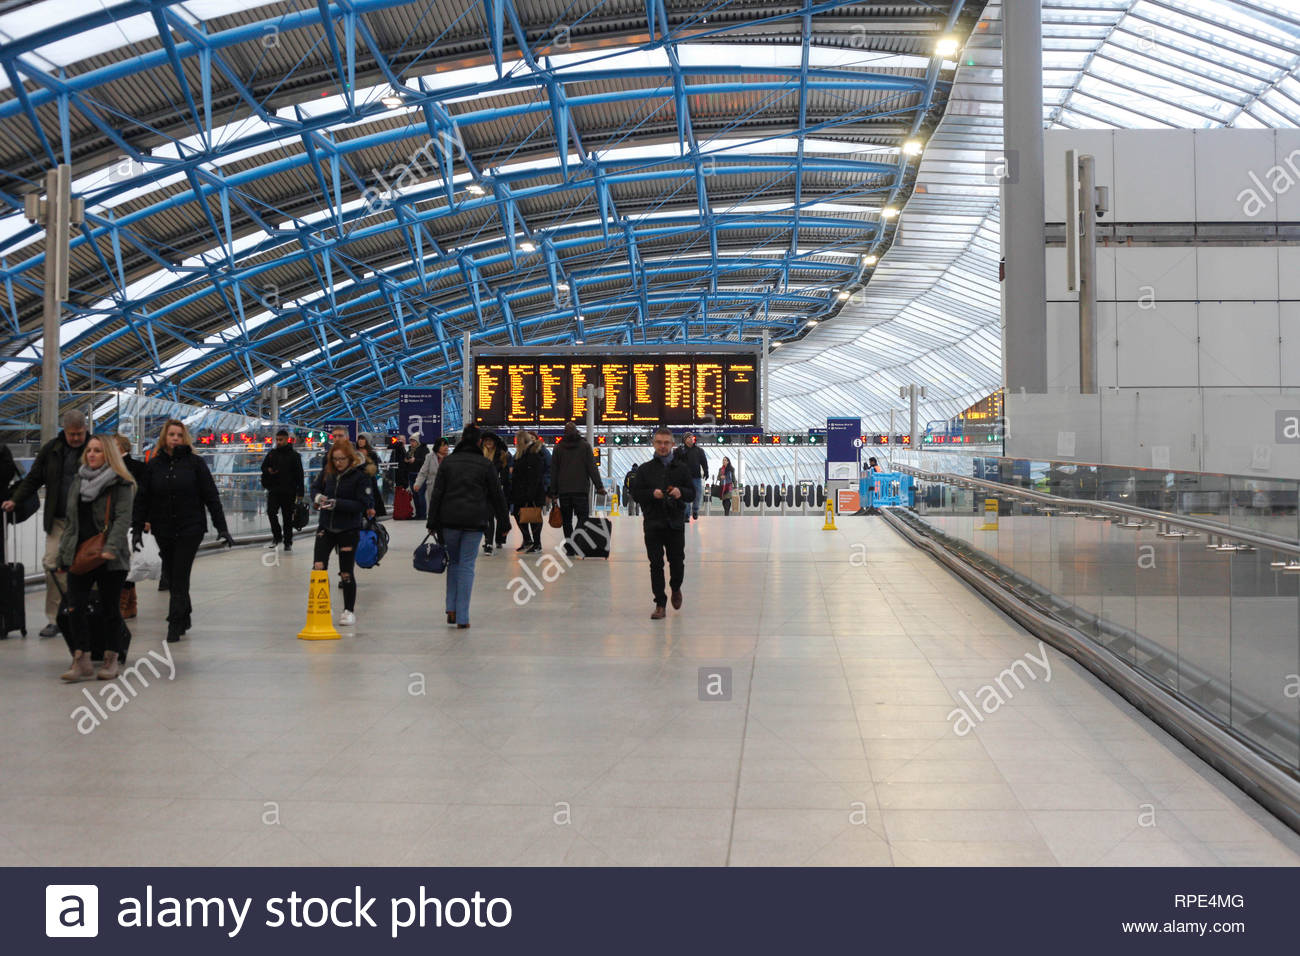 Waterloo station, London, England, UK - Stock Image